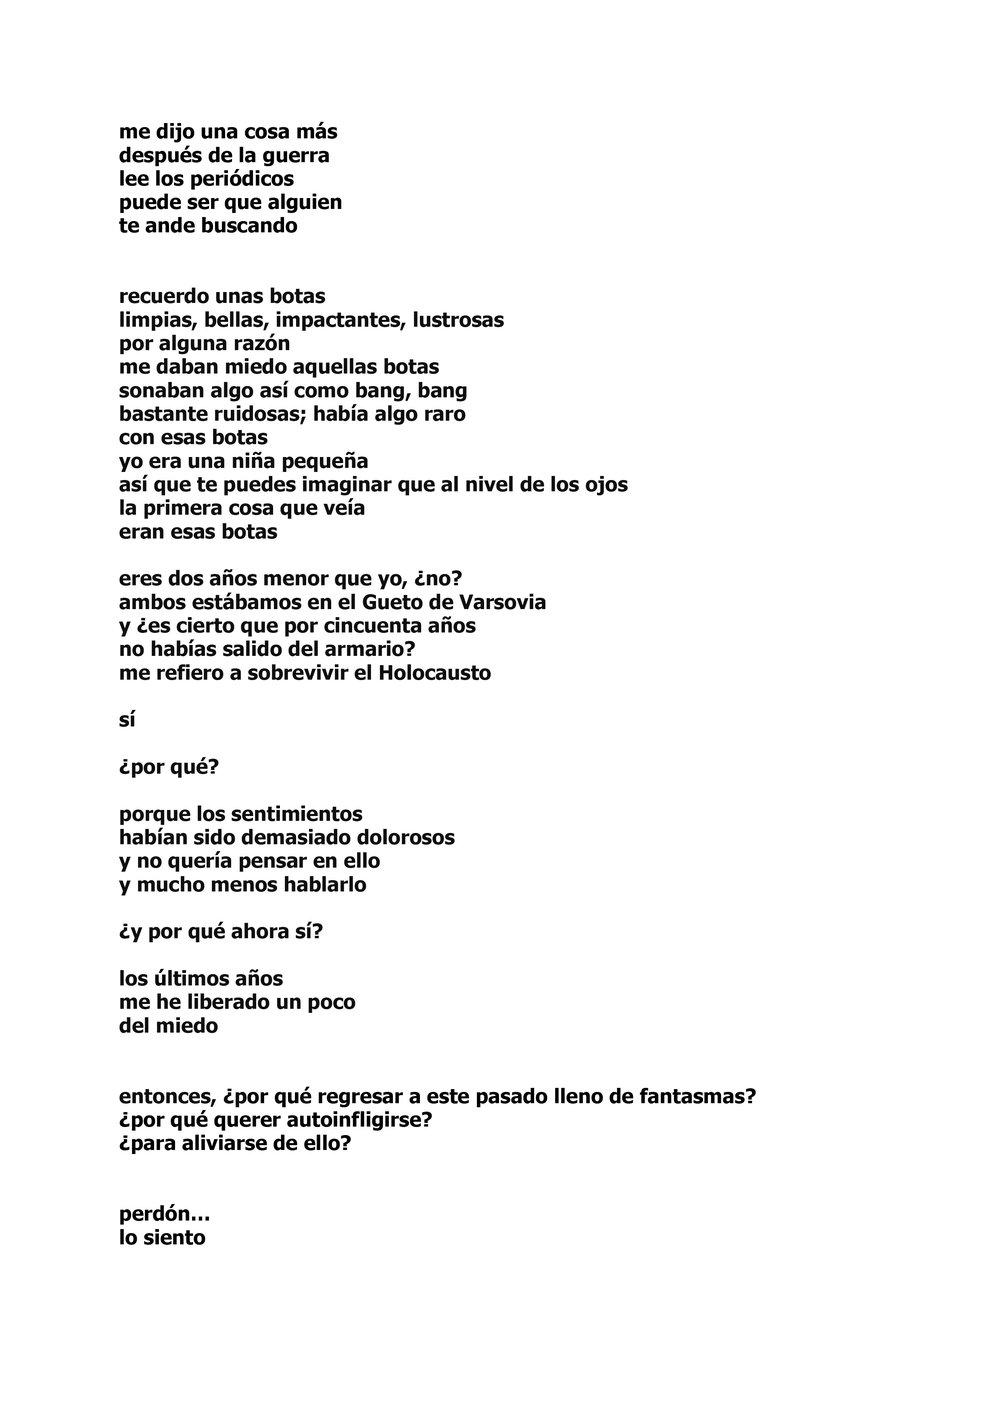 SPANISH-SCRIPT--4.jpg